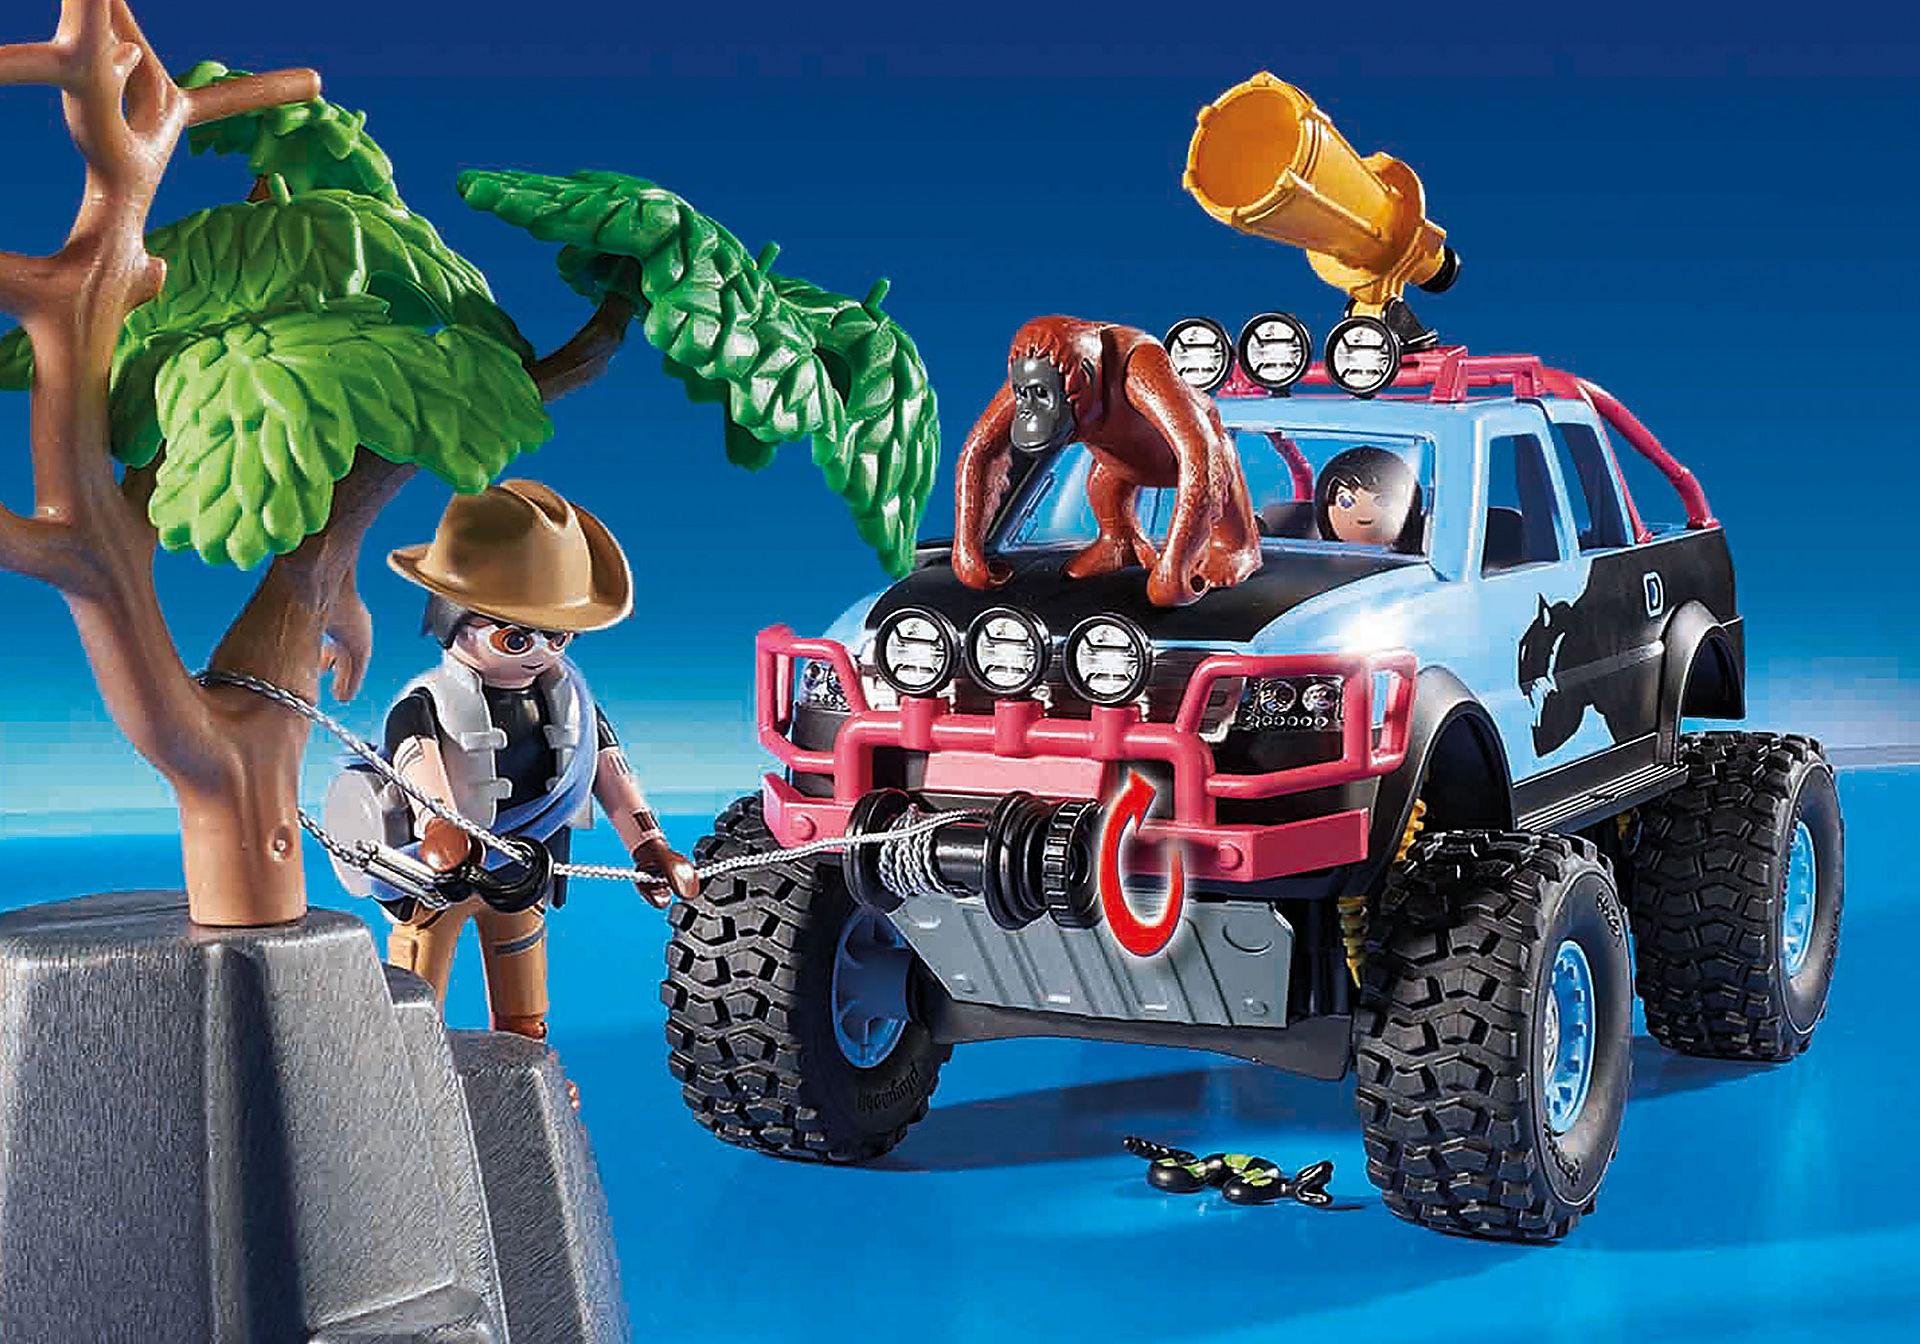 http://media.playmobil.com/i/playmobil/9407_product_extra2/Monster Truck mit Alex und Rock Brock